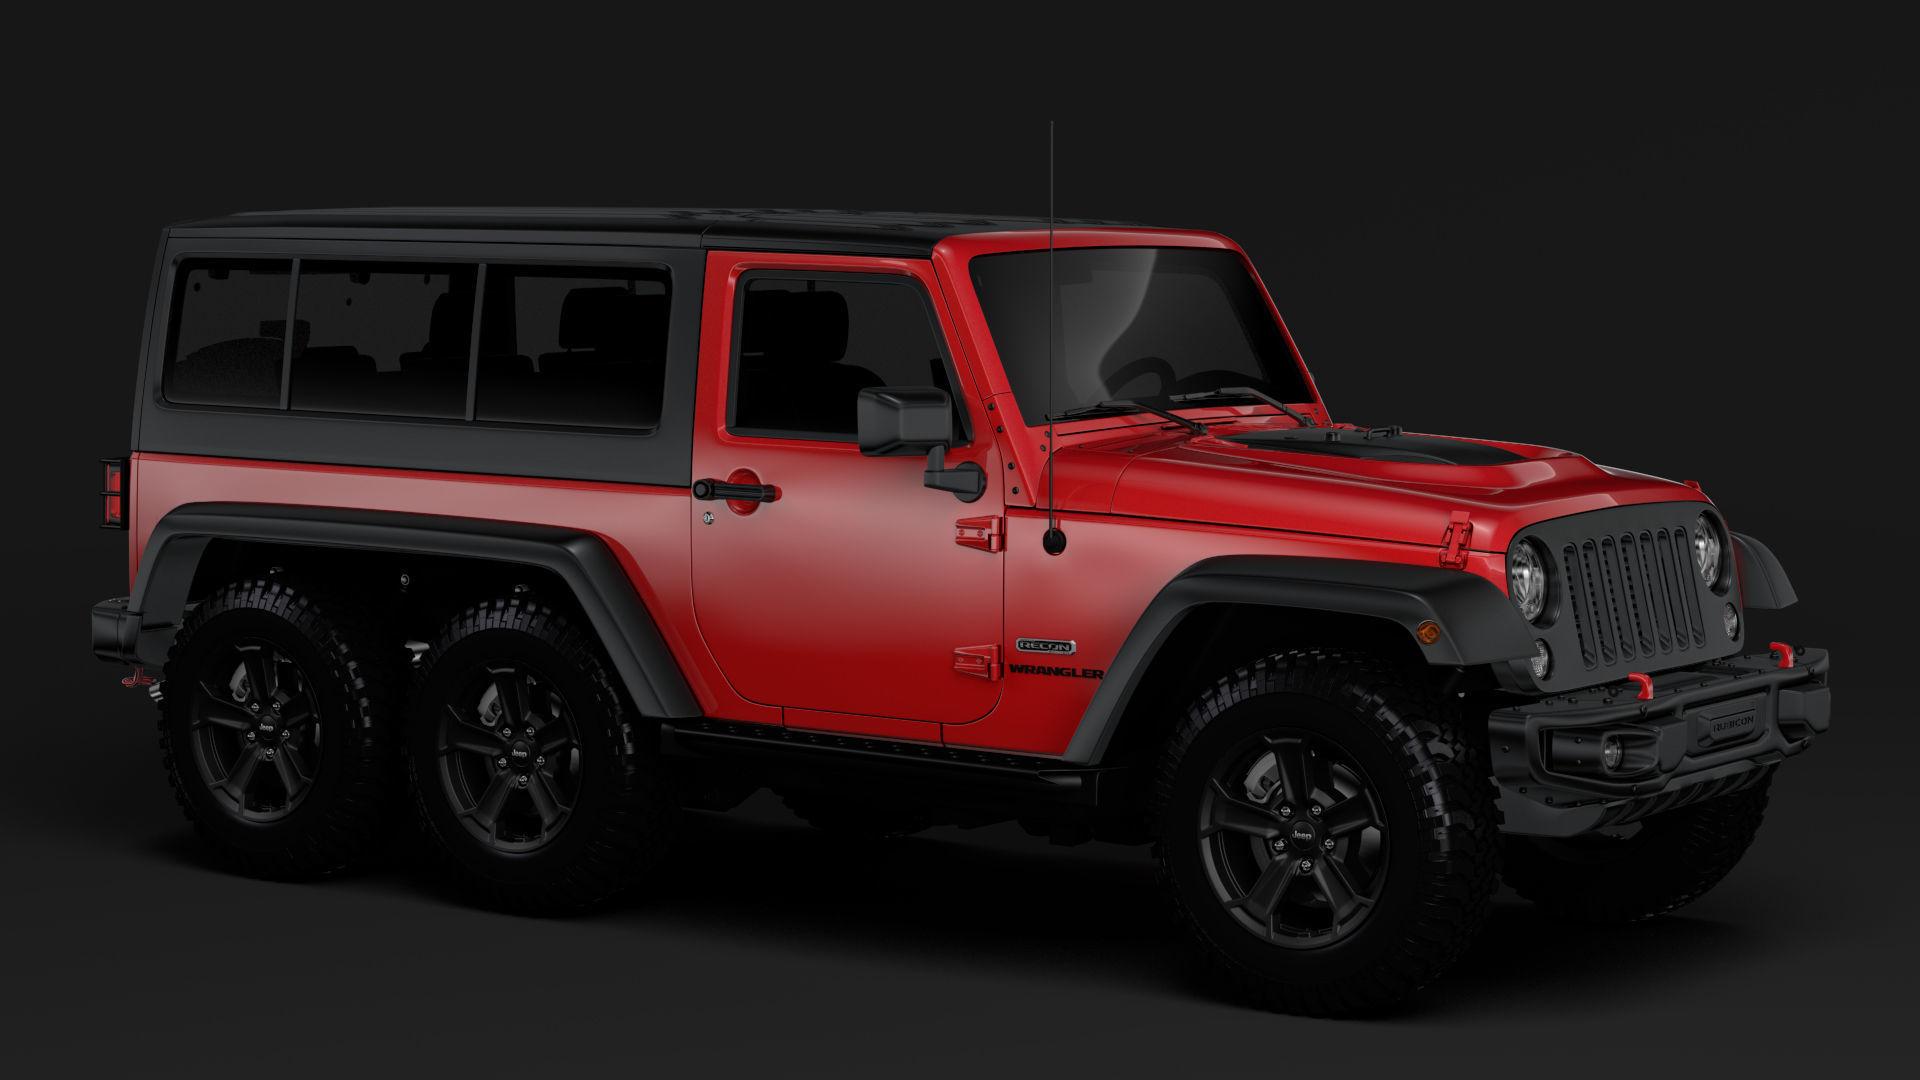 3d Model Jeep Wrangler 6x6 Rubicon Recon Jk 2017